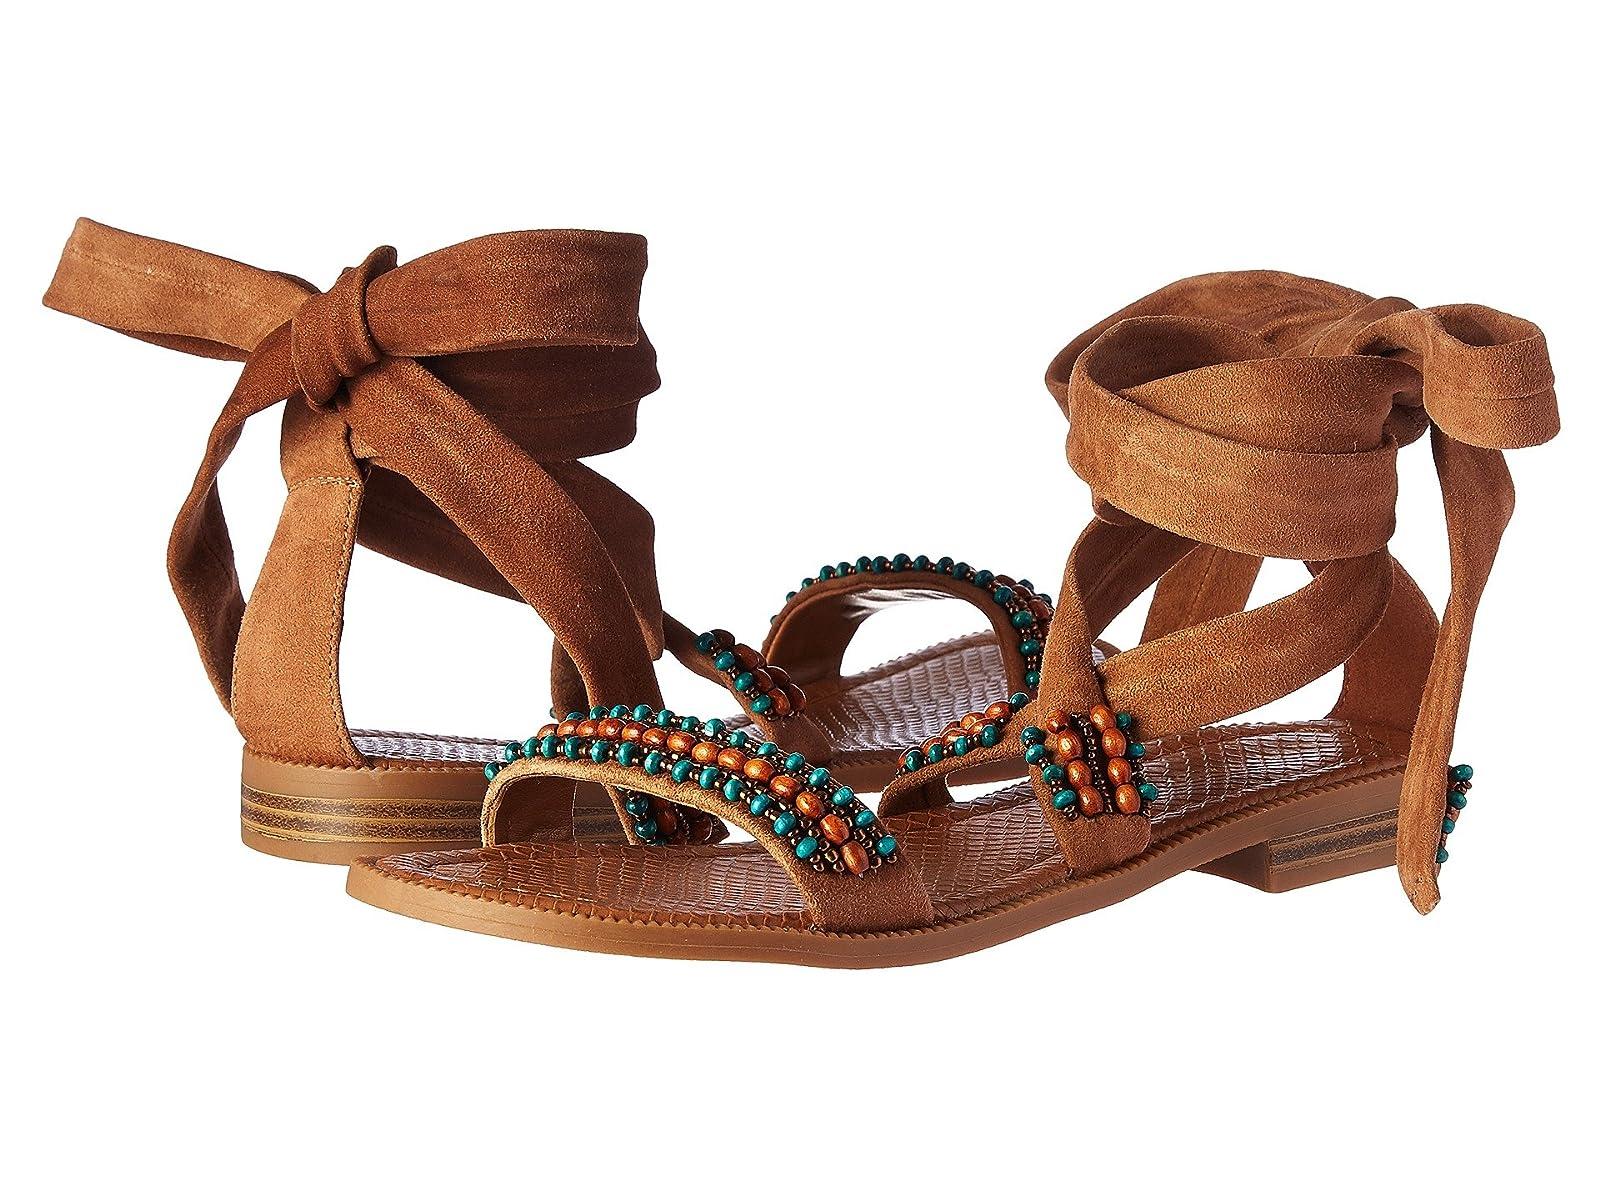 Nine West XoannaCheap and distinctive eye-catching shoes